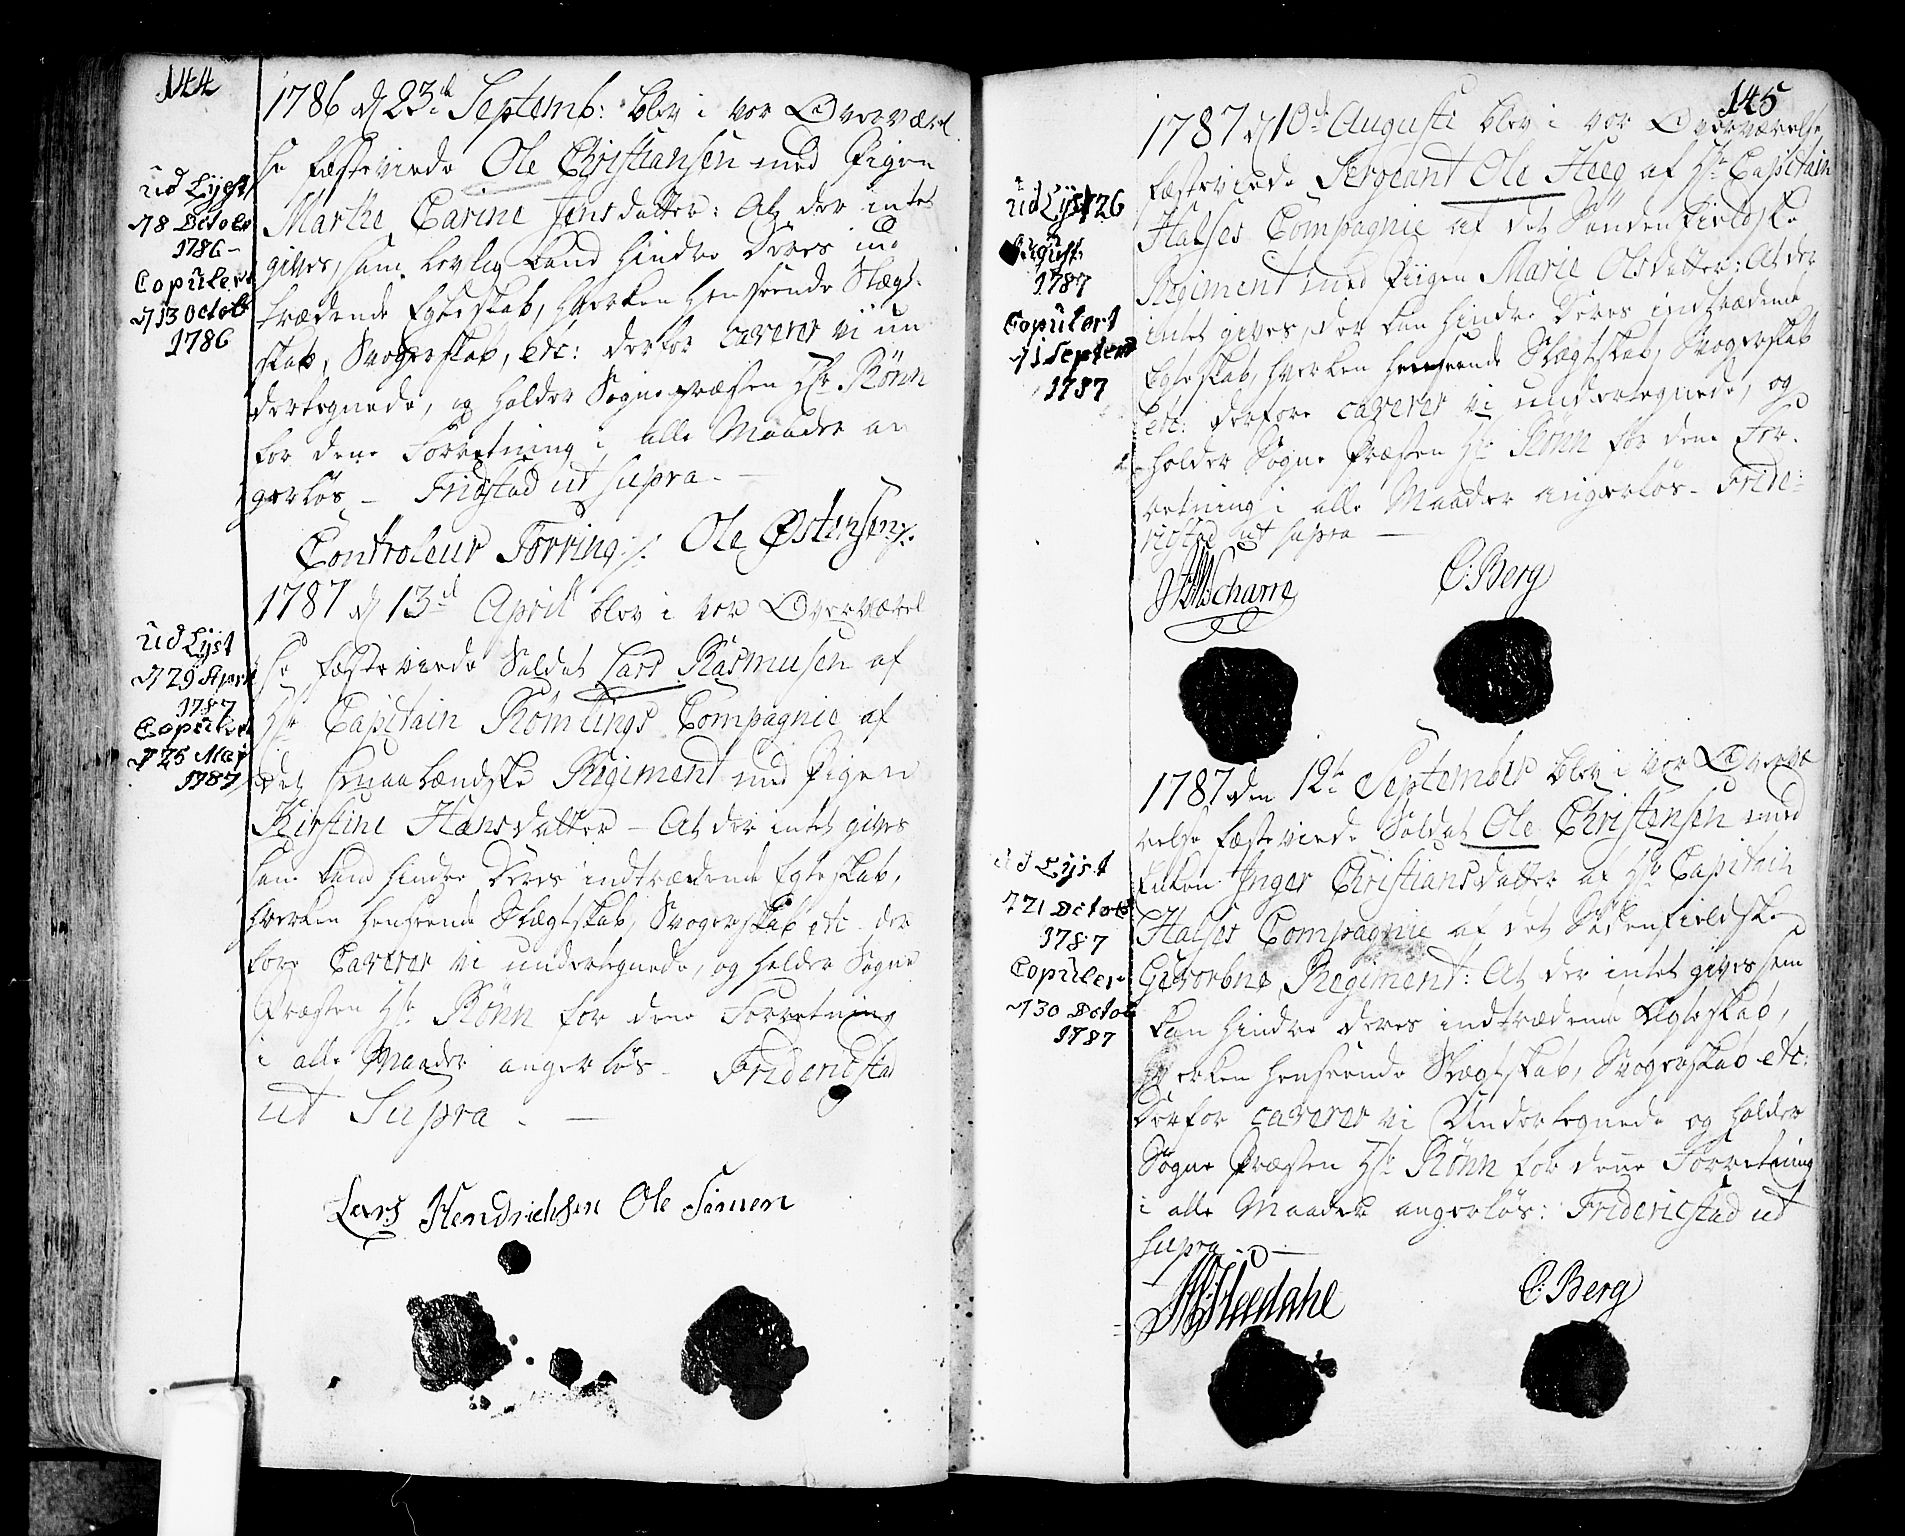 SAO, Fredrikstad prestekontor Kirkebøker, F/Fa/L0002: Ministerialbok nr. 2, 1750-1804, s. 144-145